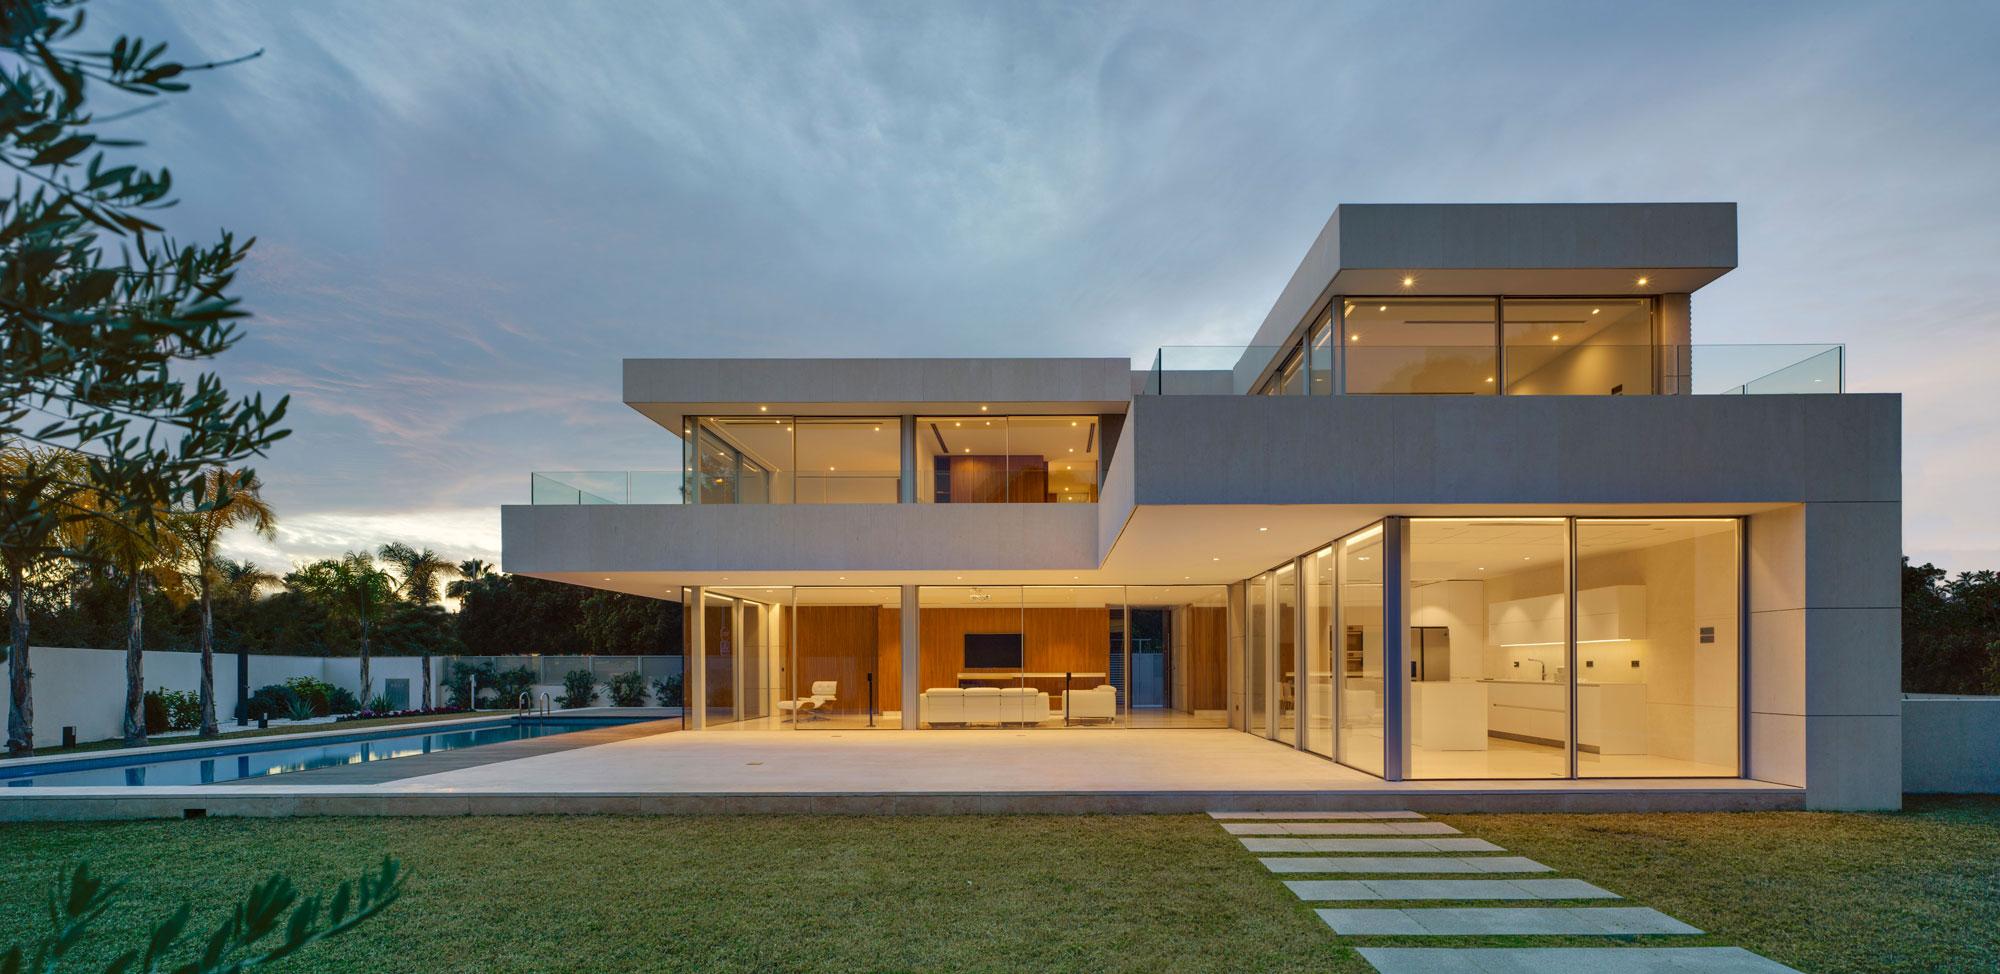 Vivienda Unifamiliar. Casa Muchavista. Casa ecológica en Alicante. Arquitectos Alicante. Arquitectos Altea. eneseis Arquitectura